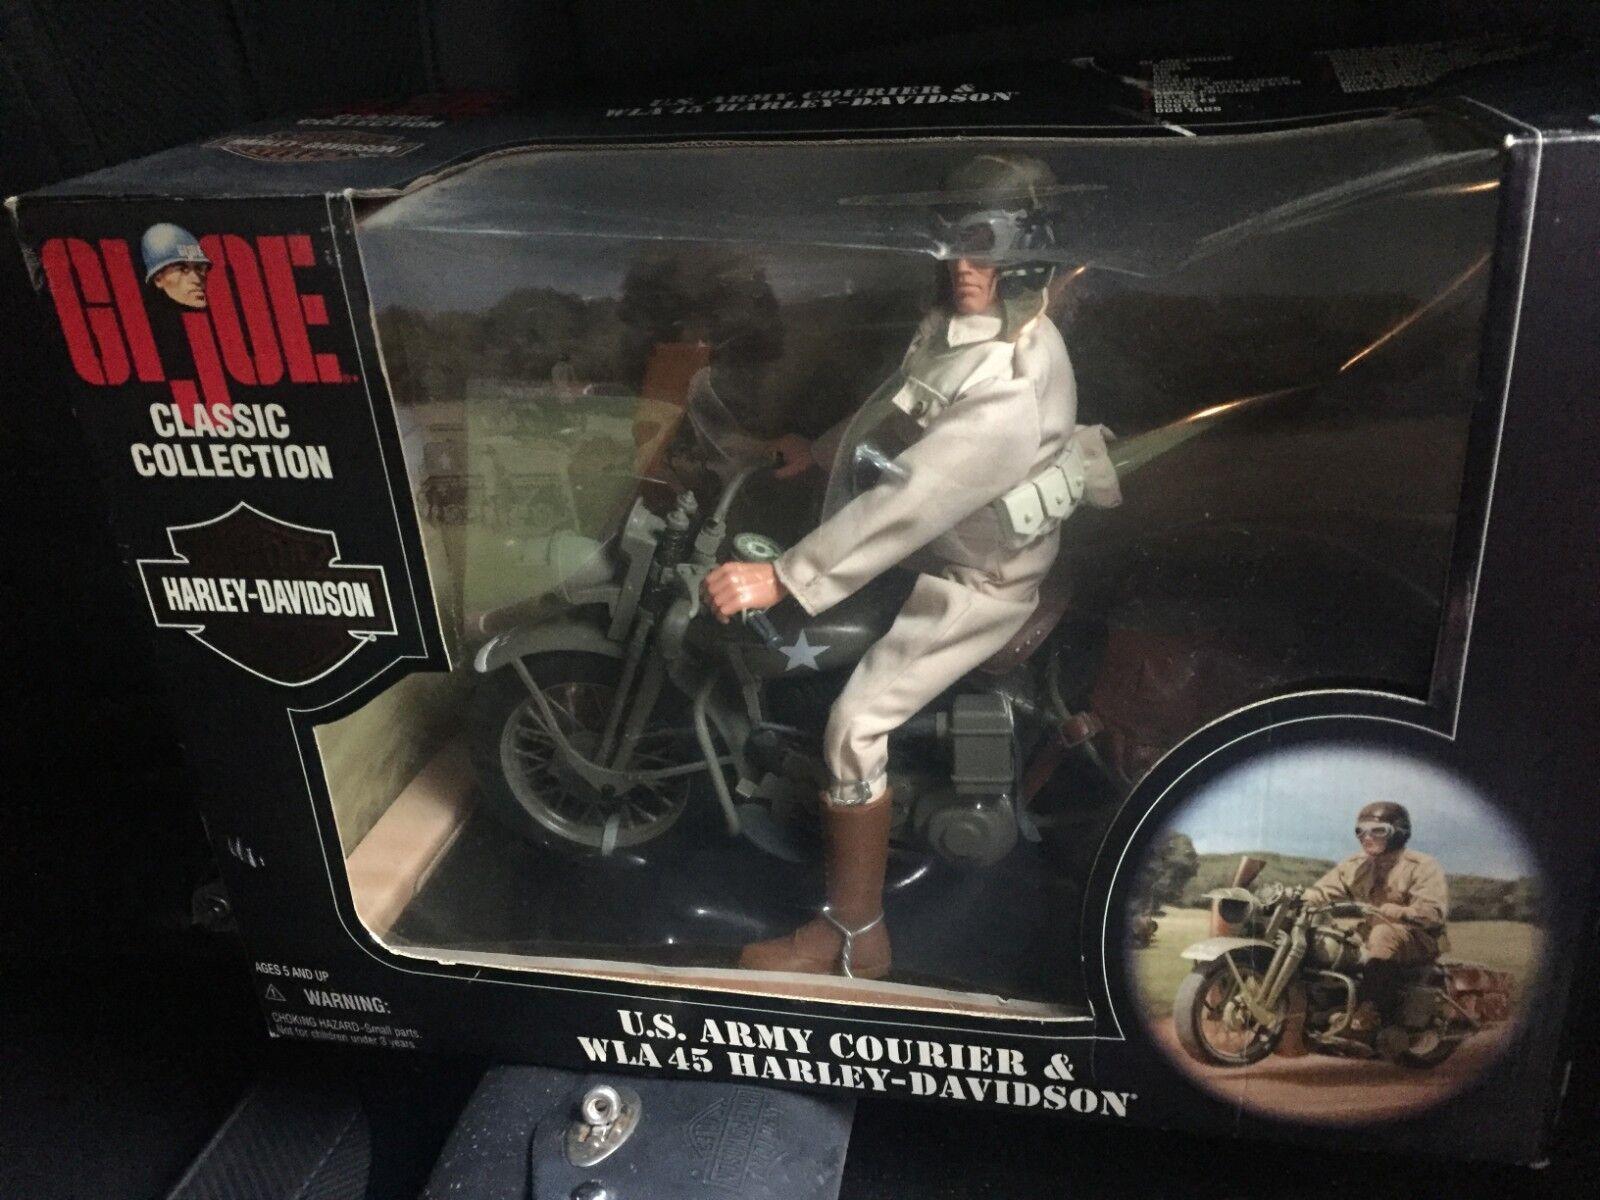 GI JOE U.S. Army Courier & WLA 45 Harley Davidson NEW